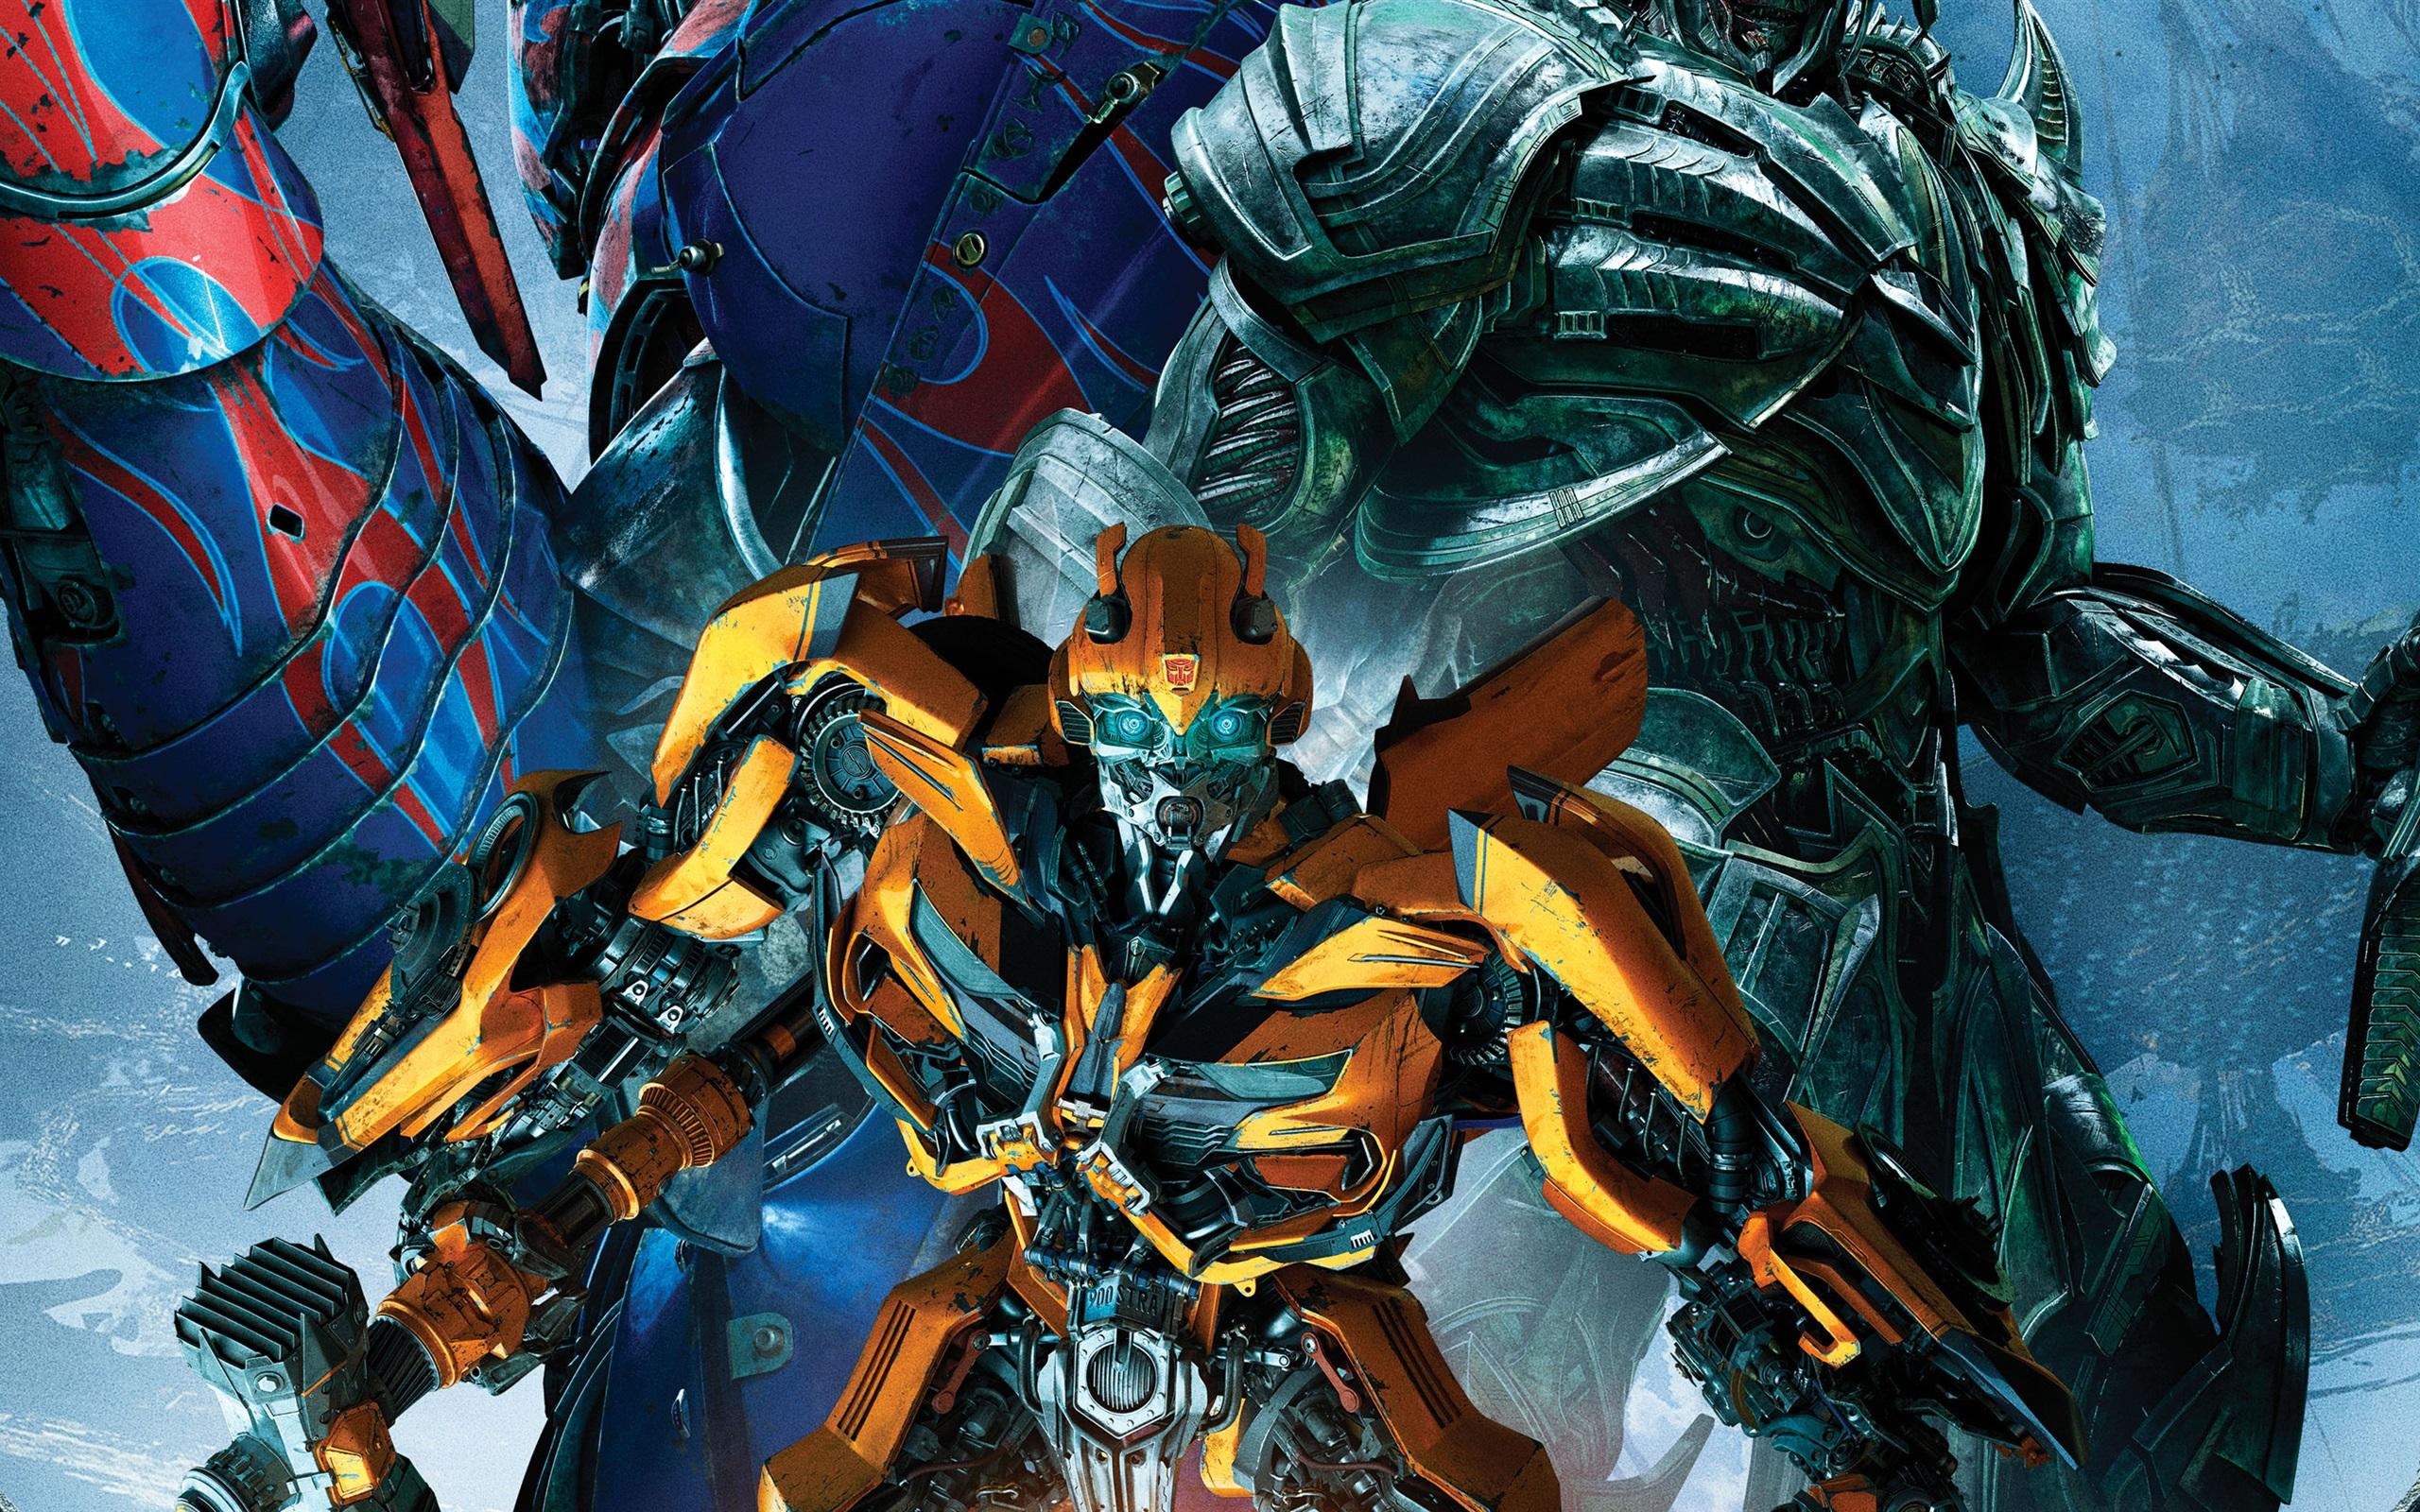 Transformers The Last Knight Movie - HD Wallpaper